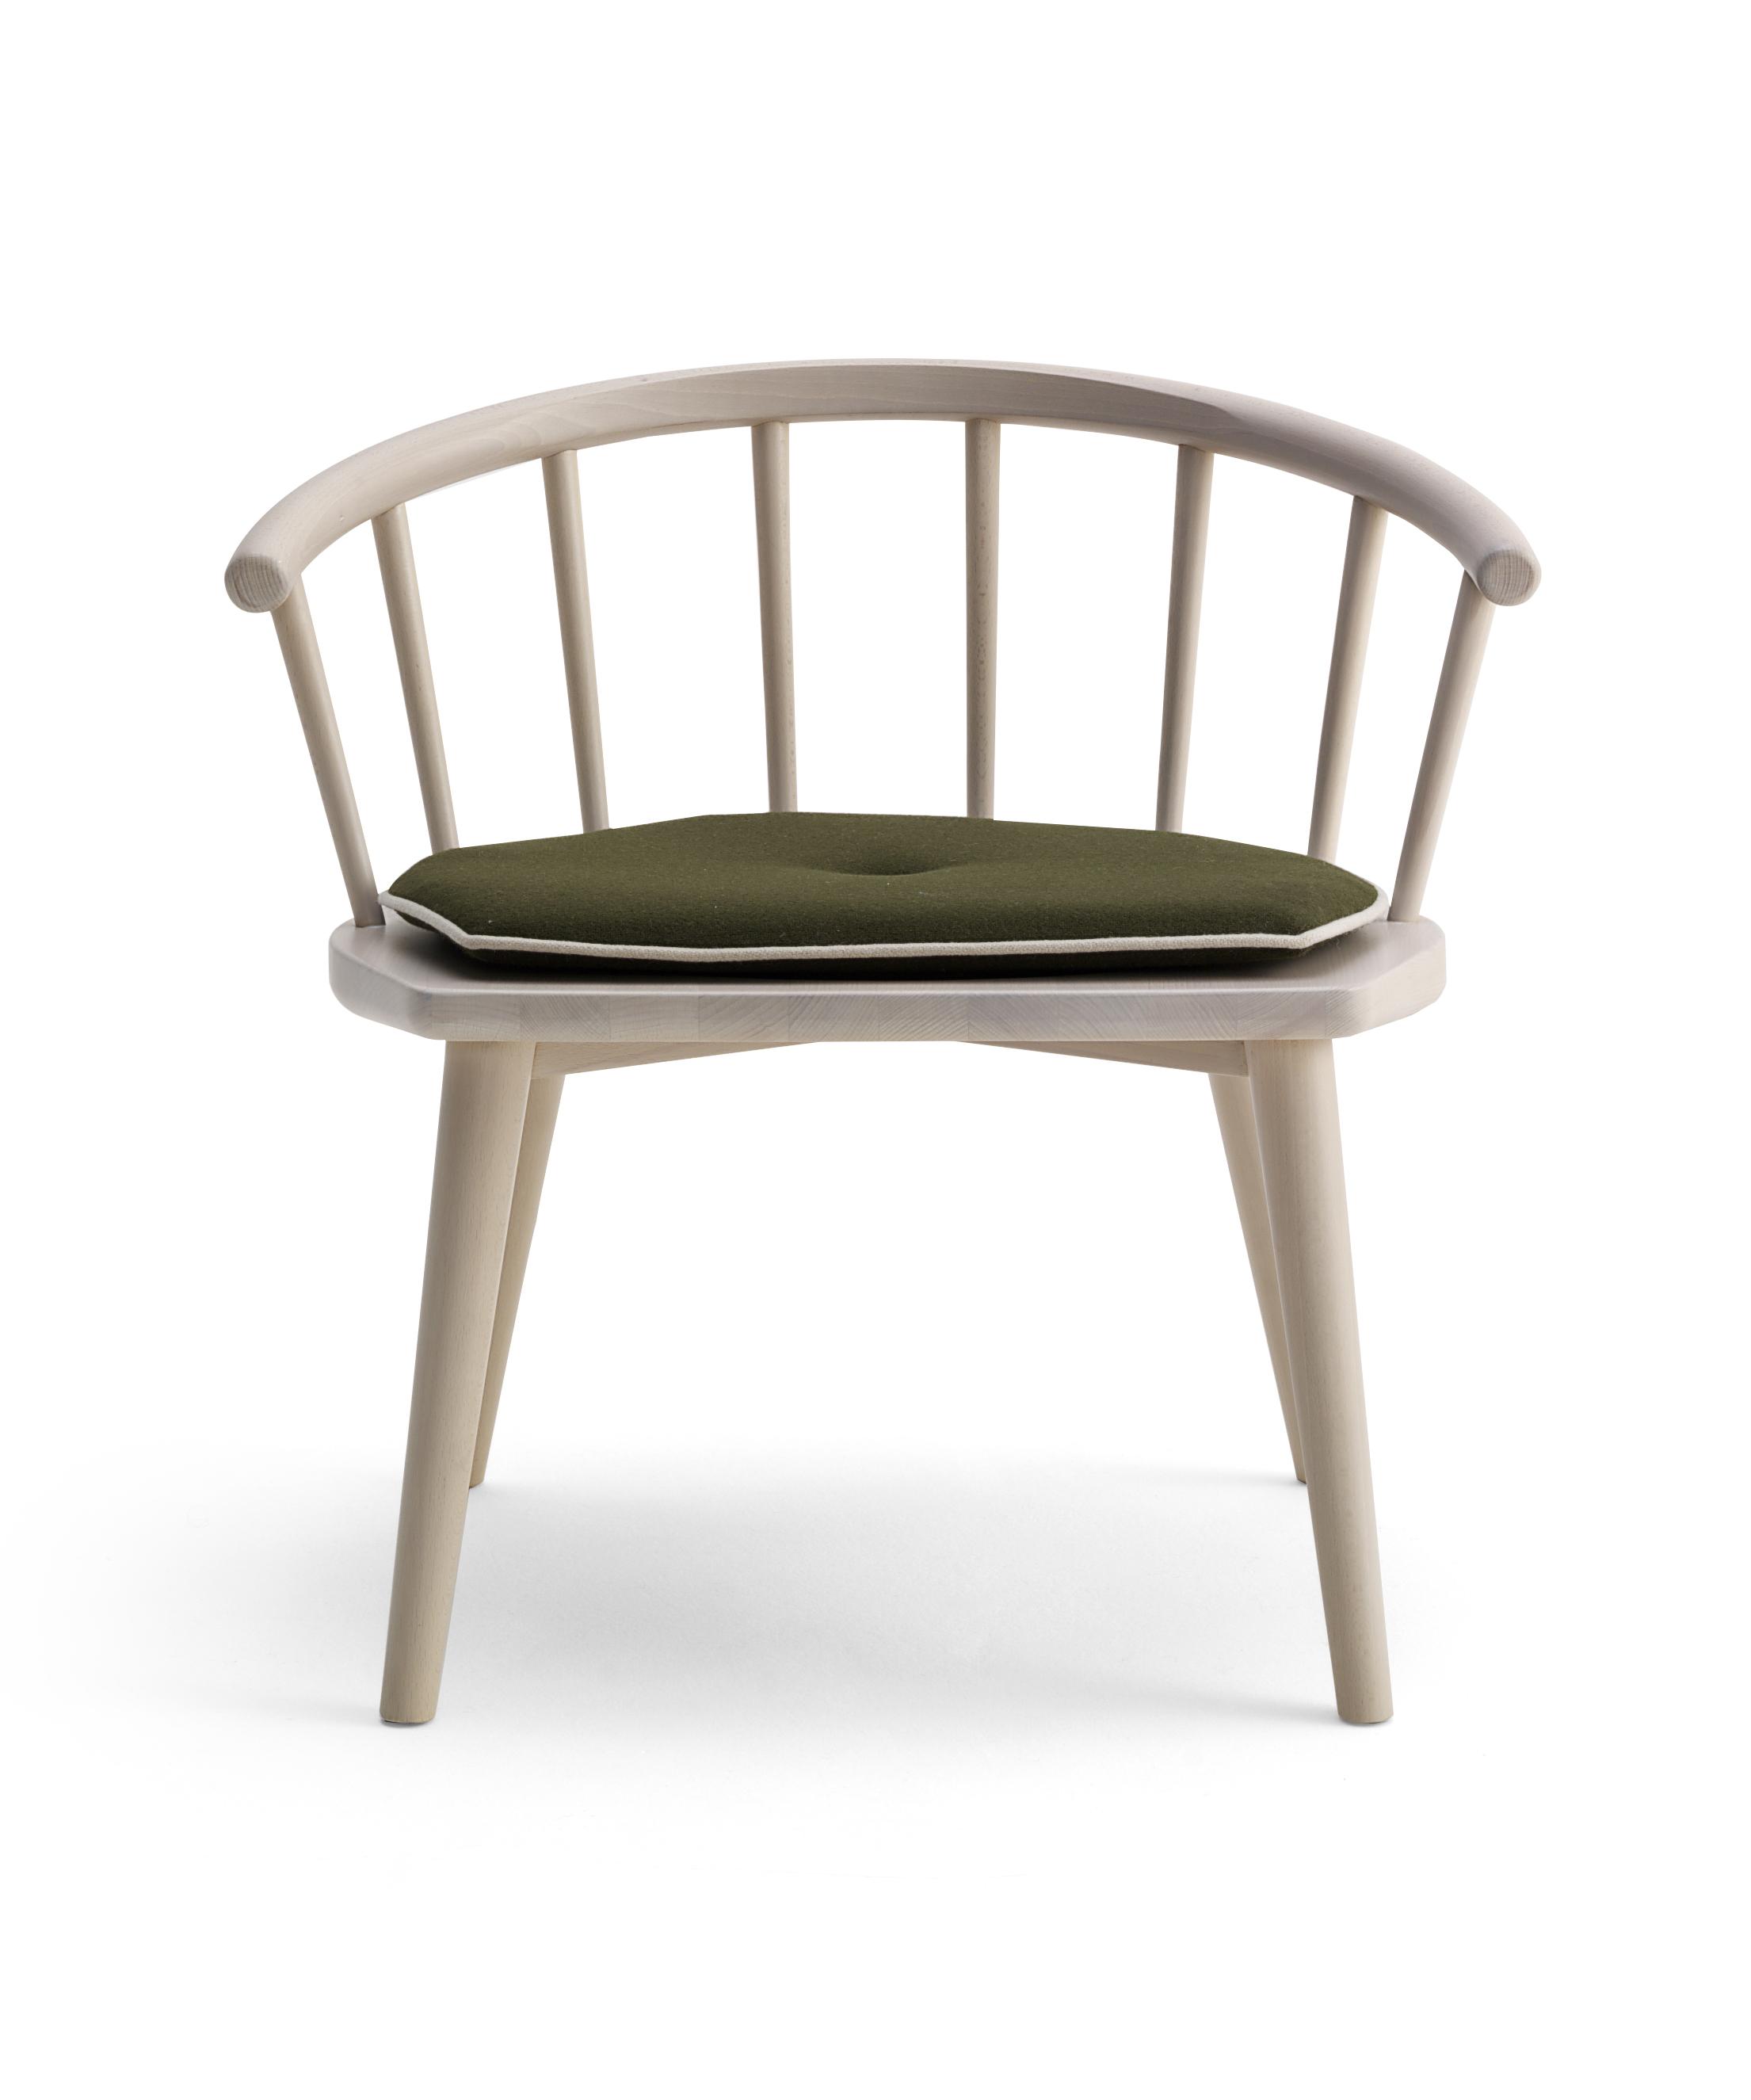 billiani-tracy armchair with seat-Frabrizio Gallinaro.jpg